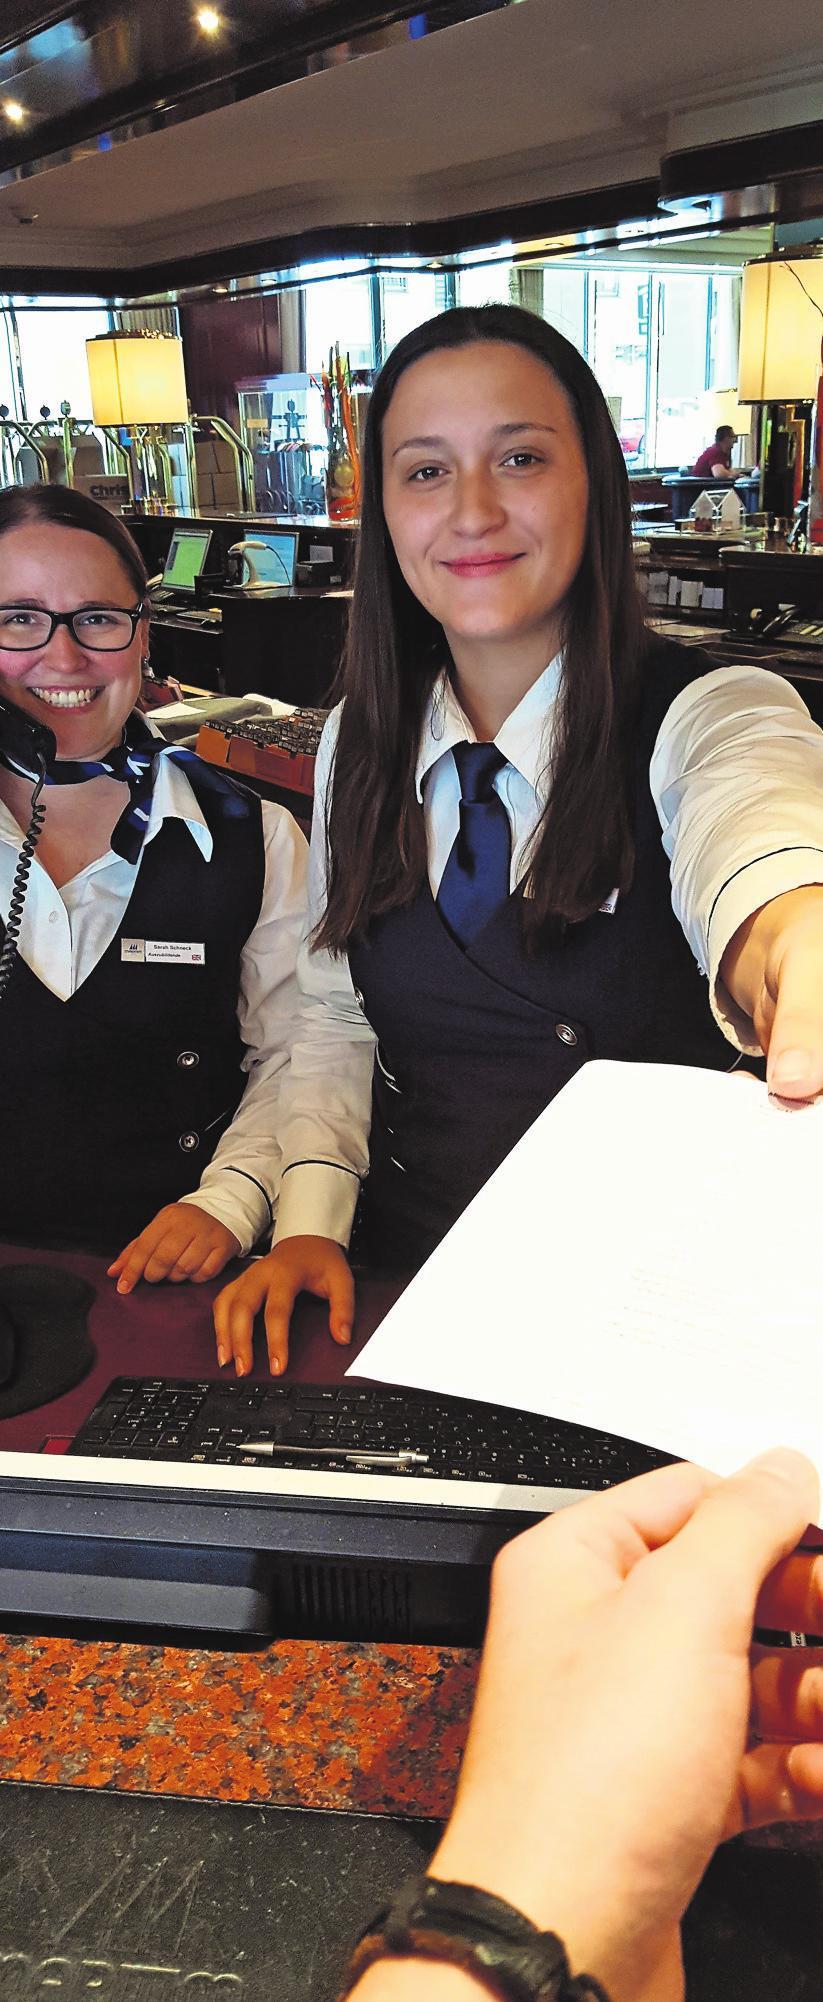 Sarah Schneck und Franziska Peres am Arbeitsplatz Foto: hf